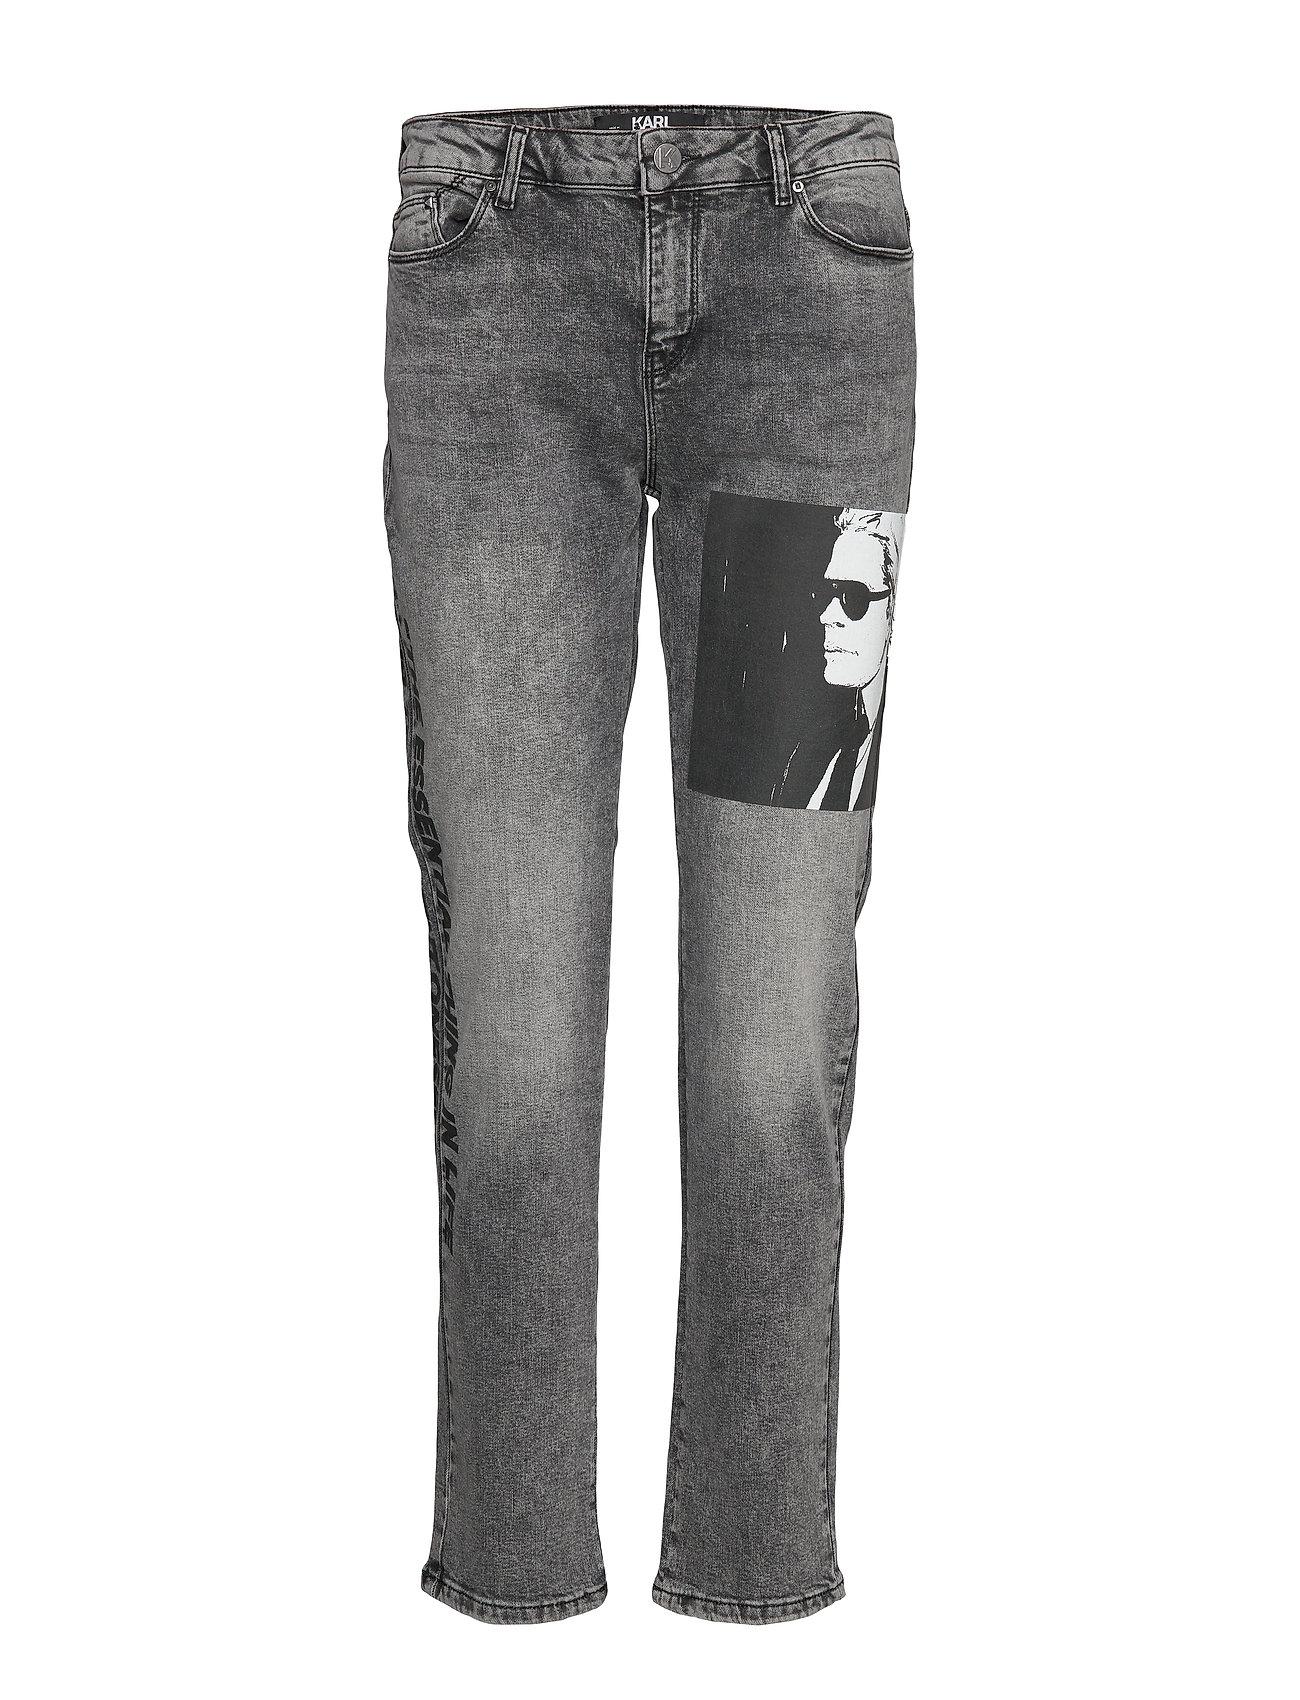 Karl Lagerfeld Karl Legend Printed Denim - GREY DENIM